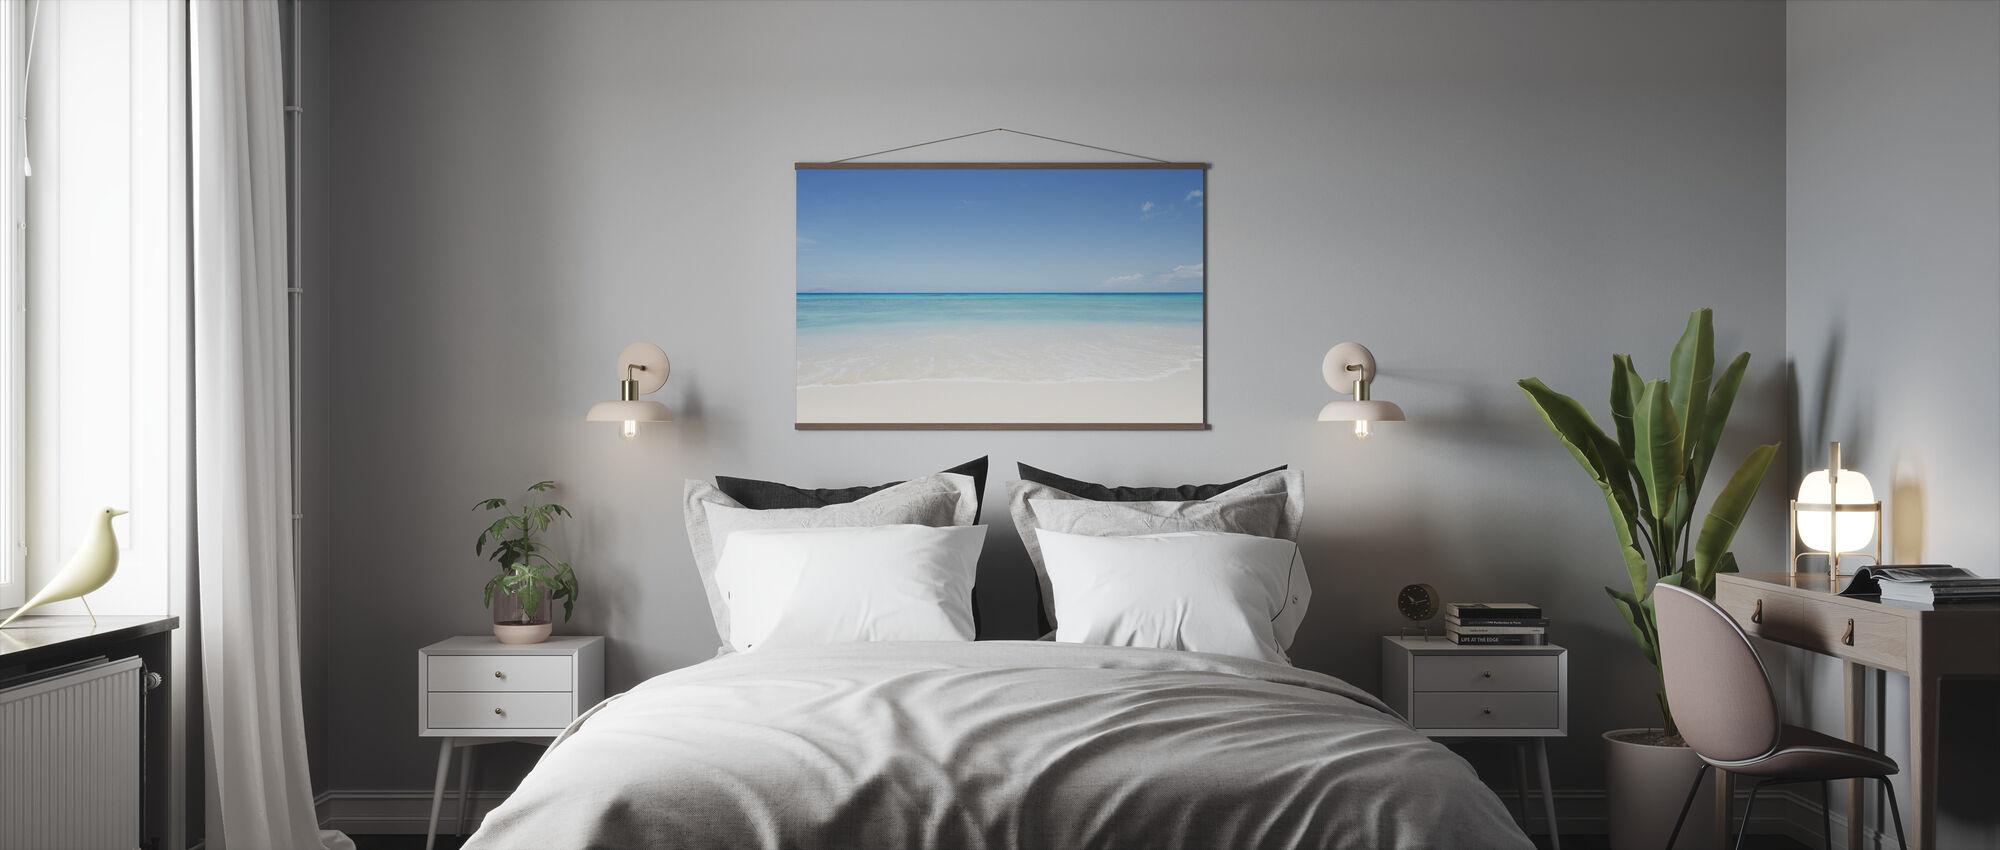 Perfect Horizon - Poster - Bedroom